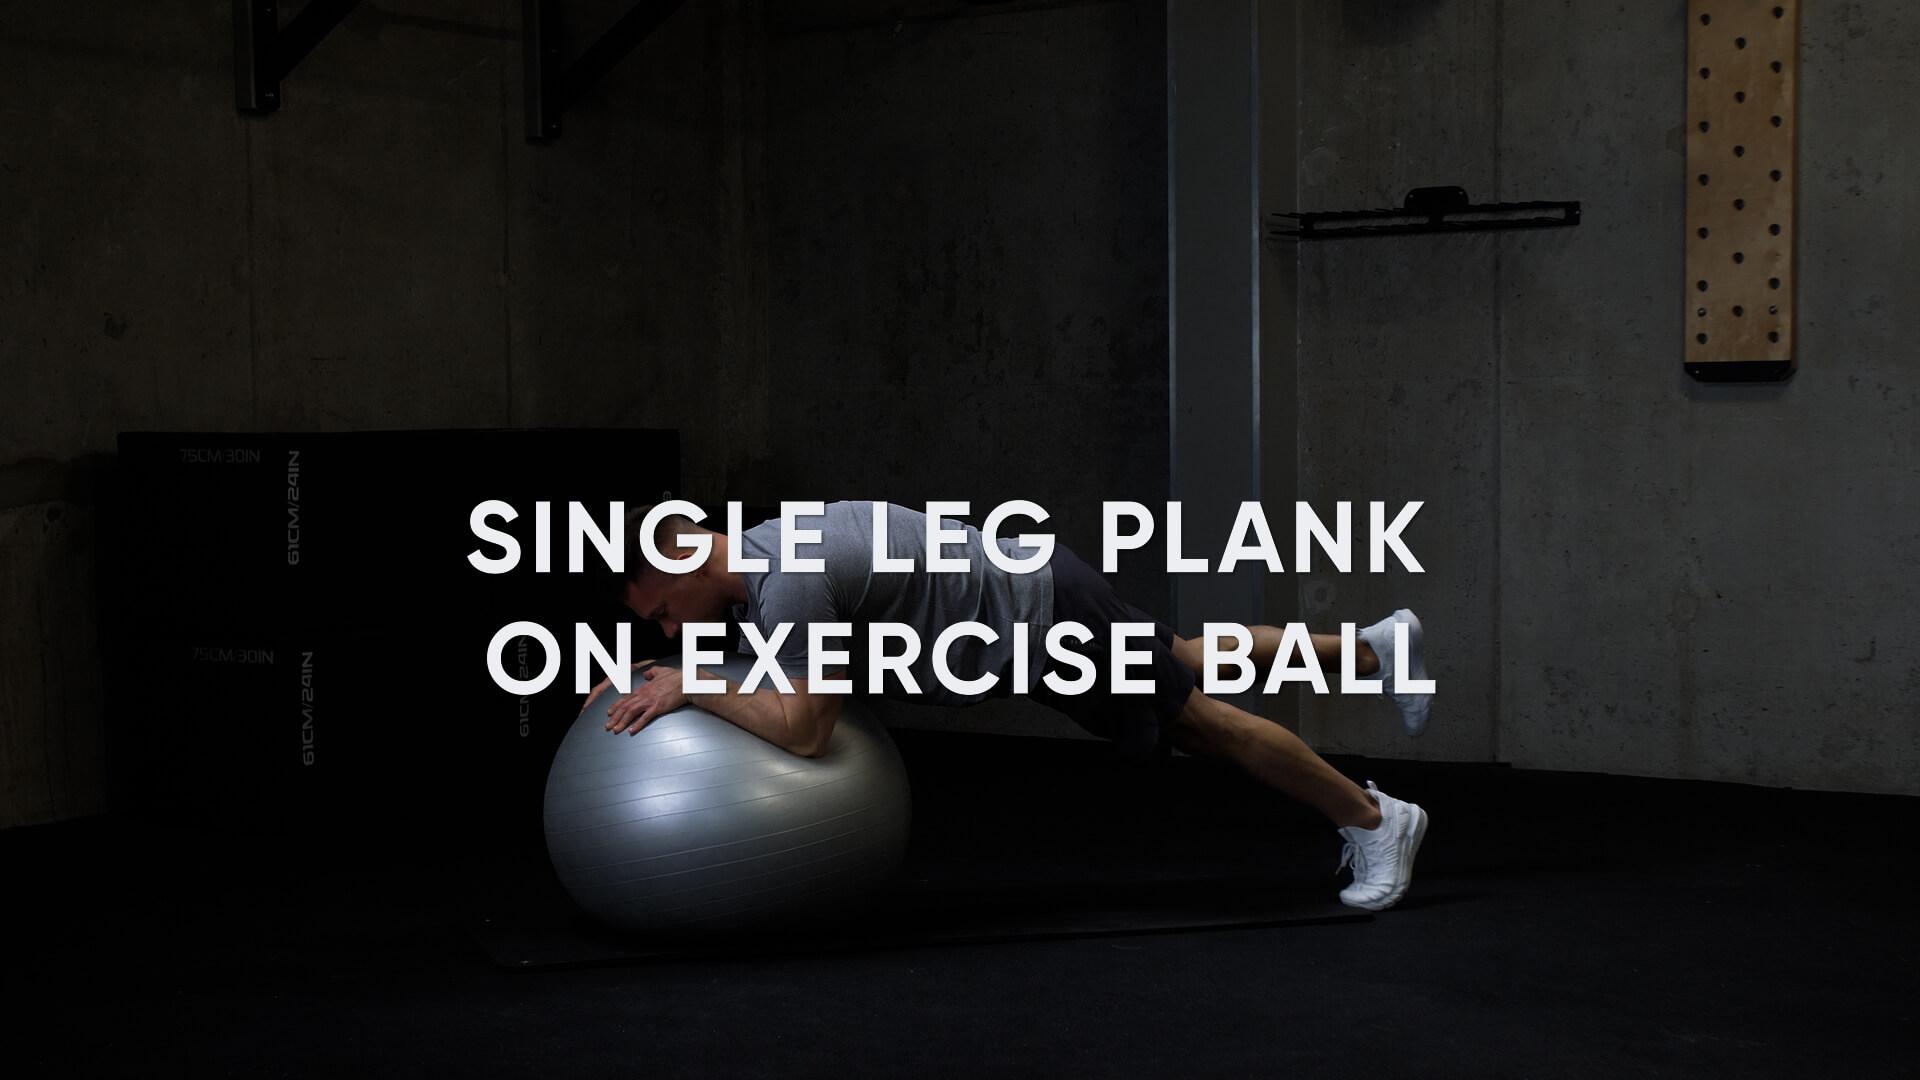 Single Leg Plank on Exercise Ball